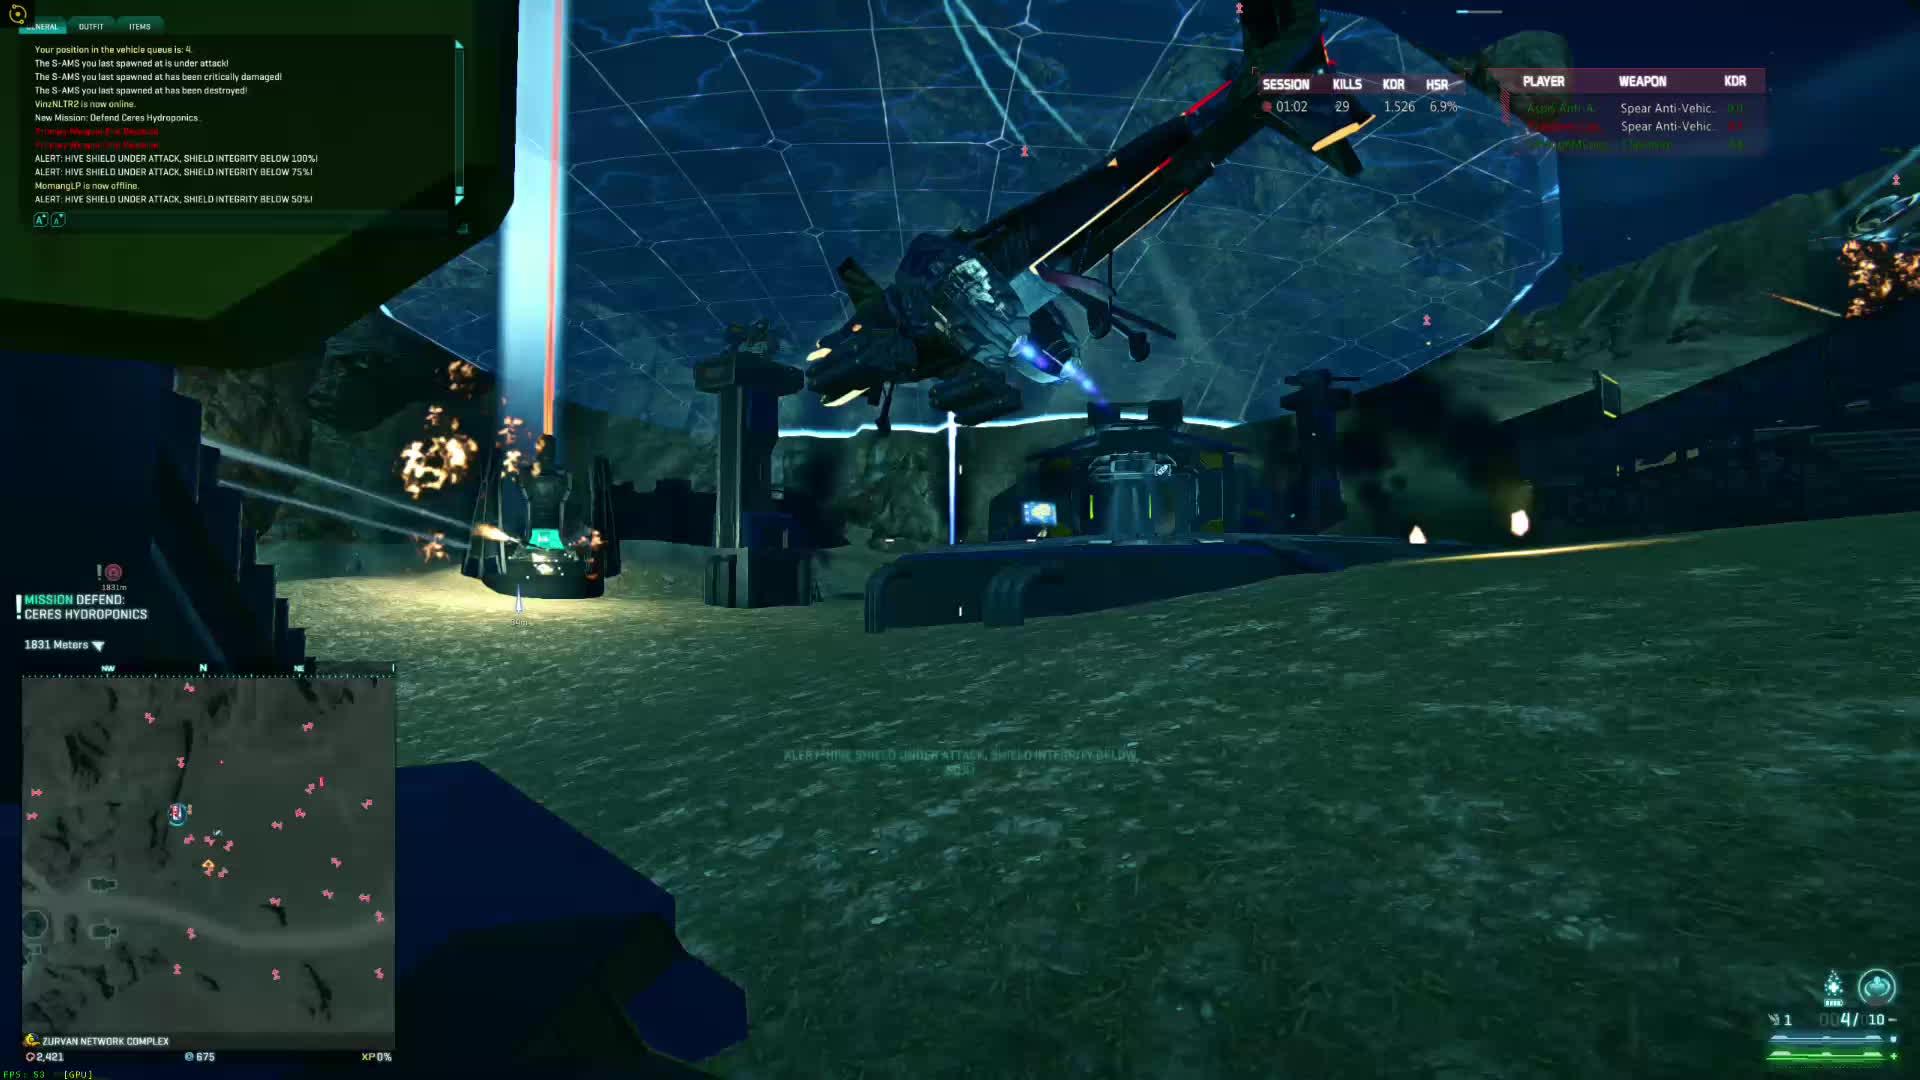 PS2Cobalt, construction, planetside 2, Planetside 2, HIVE gank by air platoon GIFs